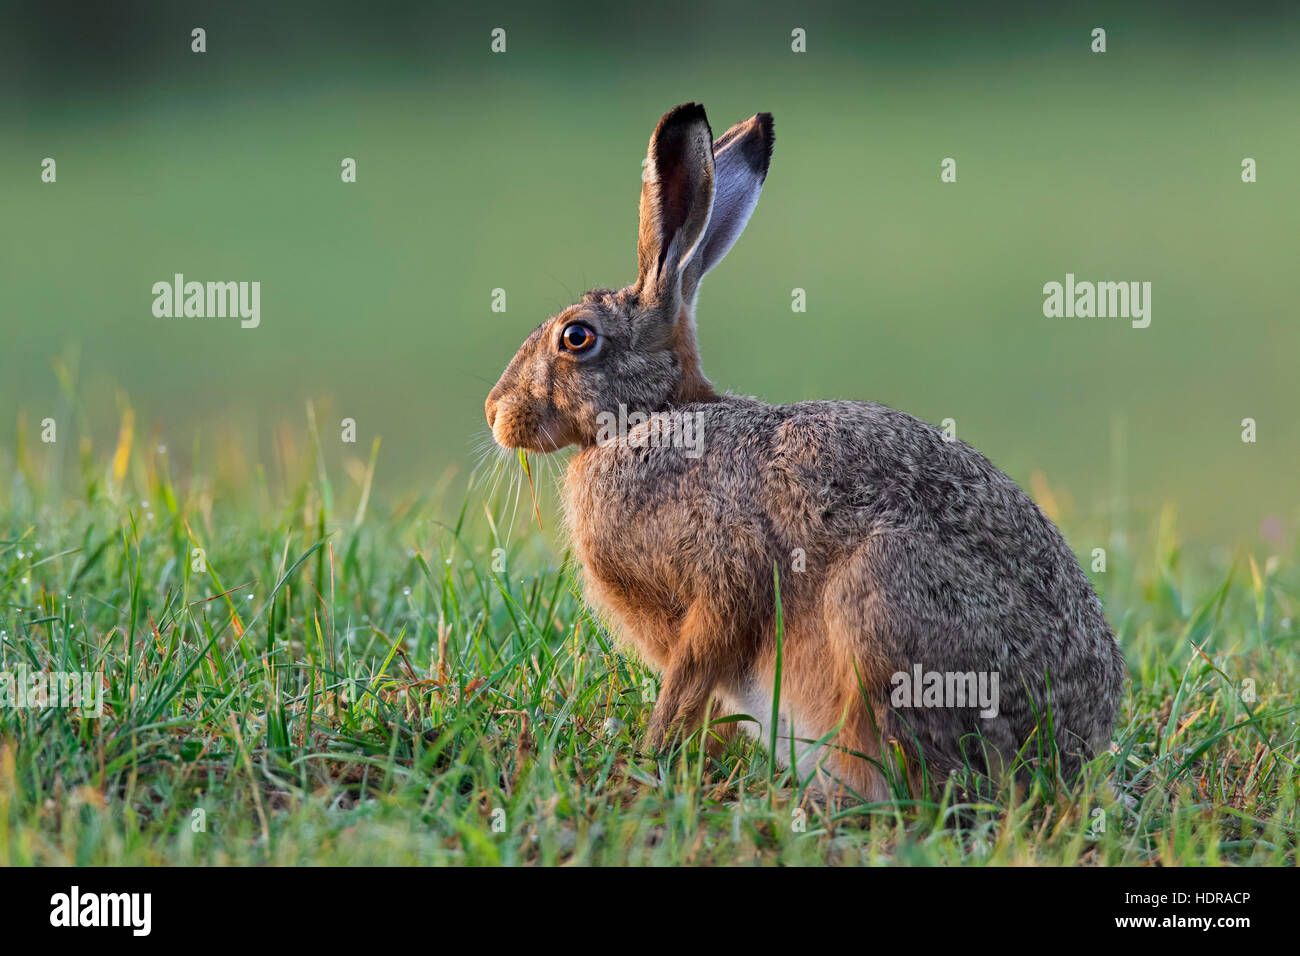 European Brown Hare (Lepus europaeus) sitting in grassland - Stock Image